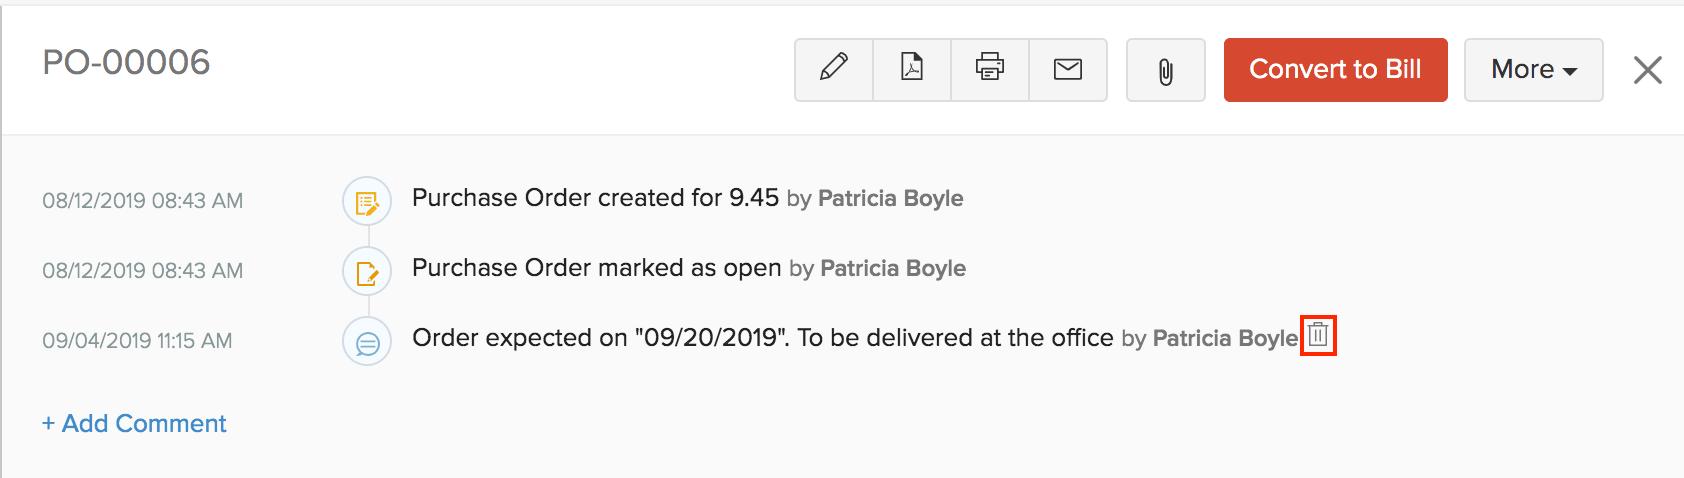 Delete Delivery Date